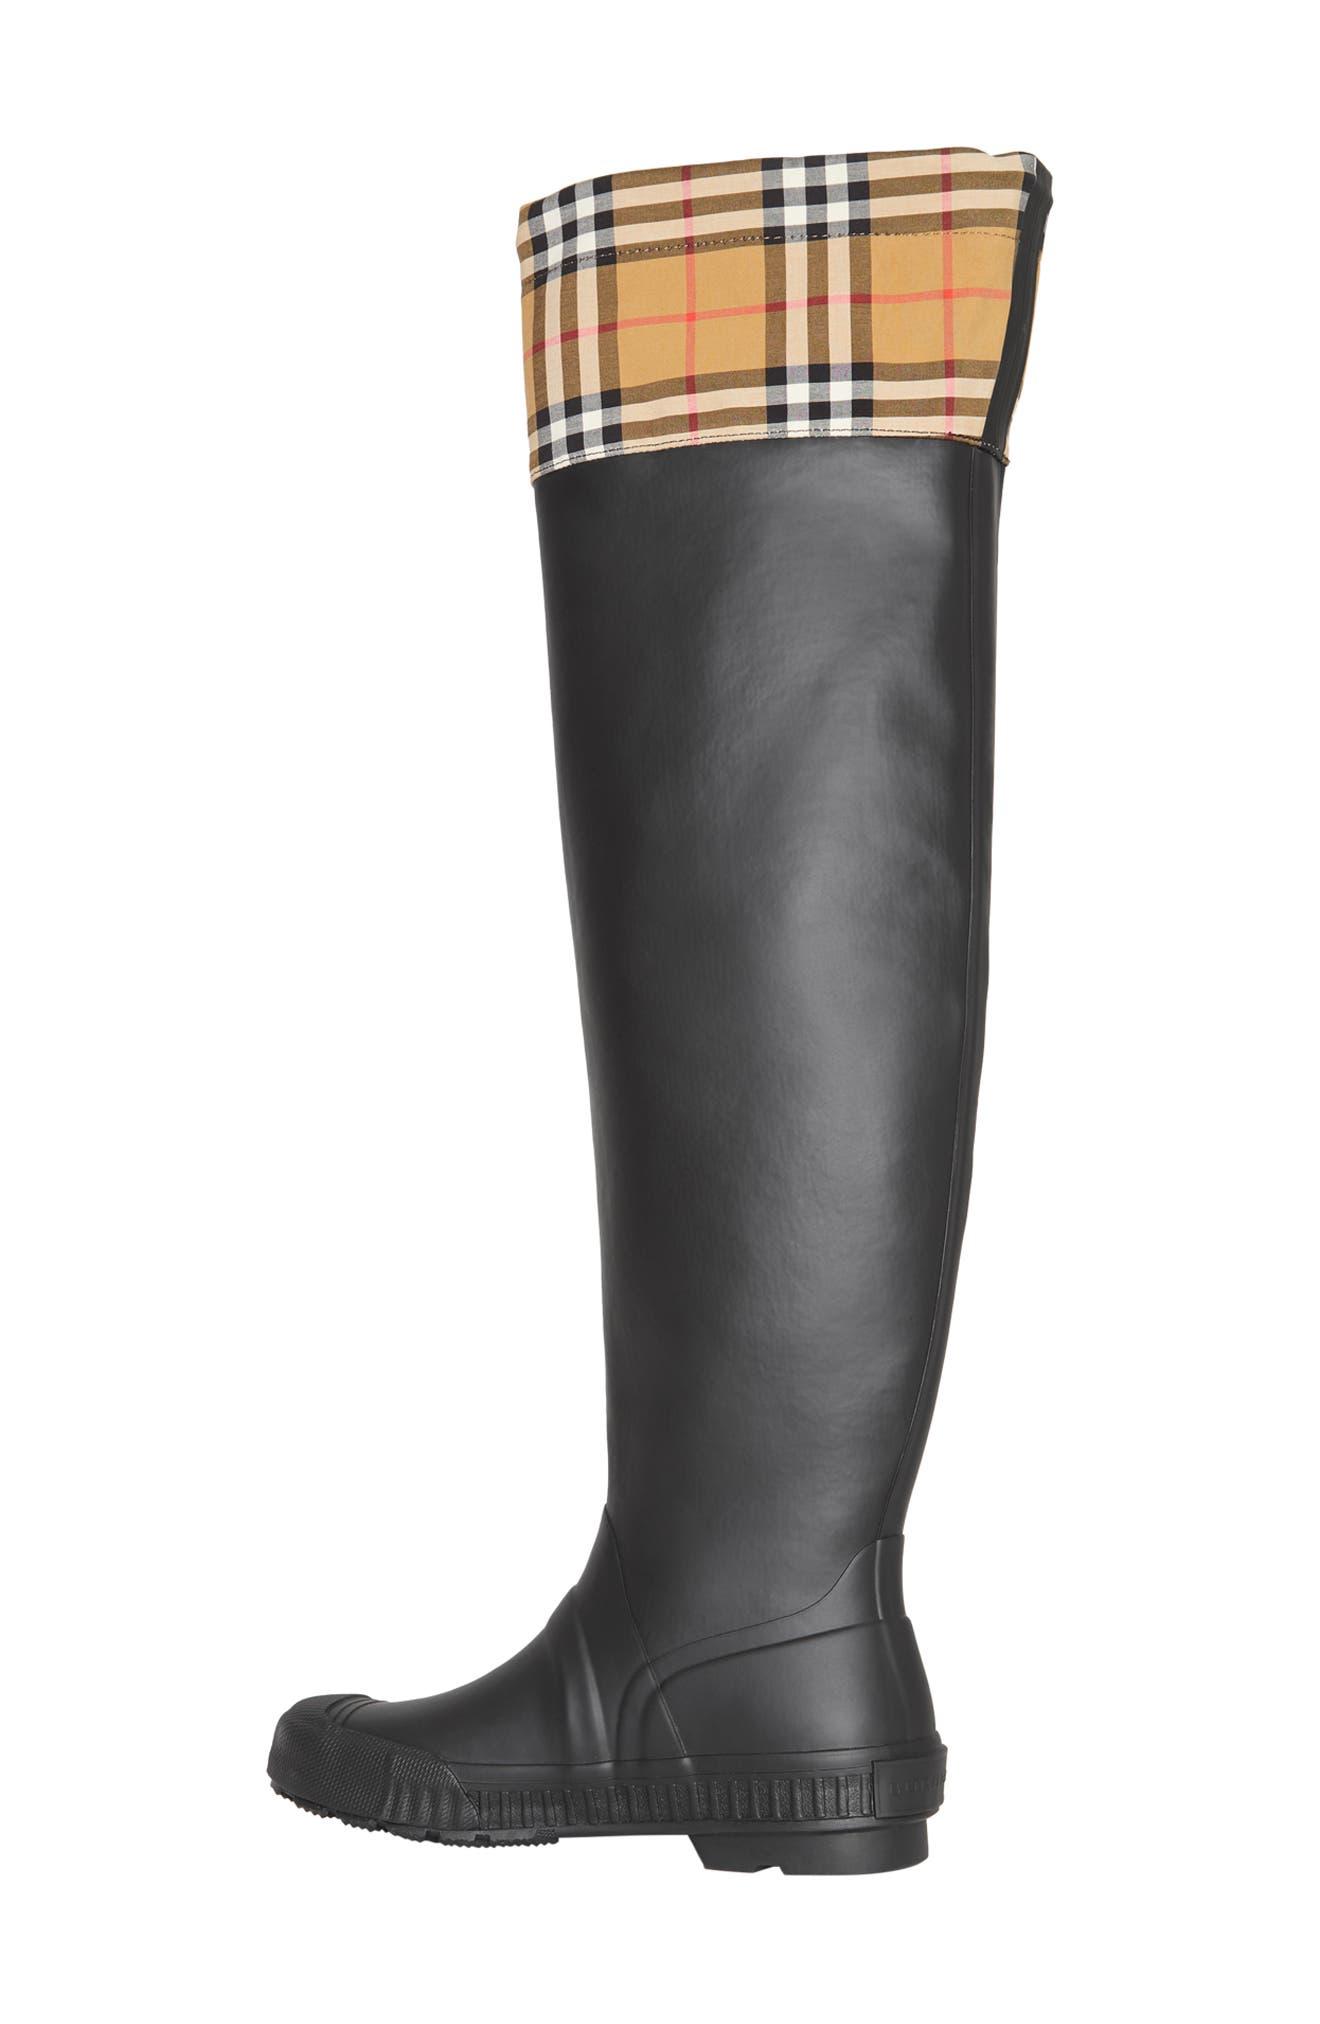 BURBERRY,                             Freddie Tall Waterproof Rain Boot,                             Alternate thumbnail 8, color,                             BLACK